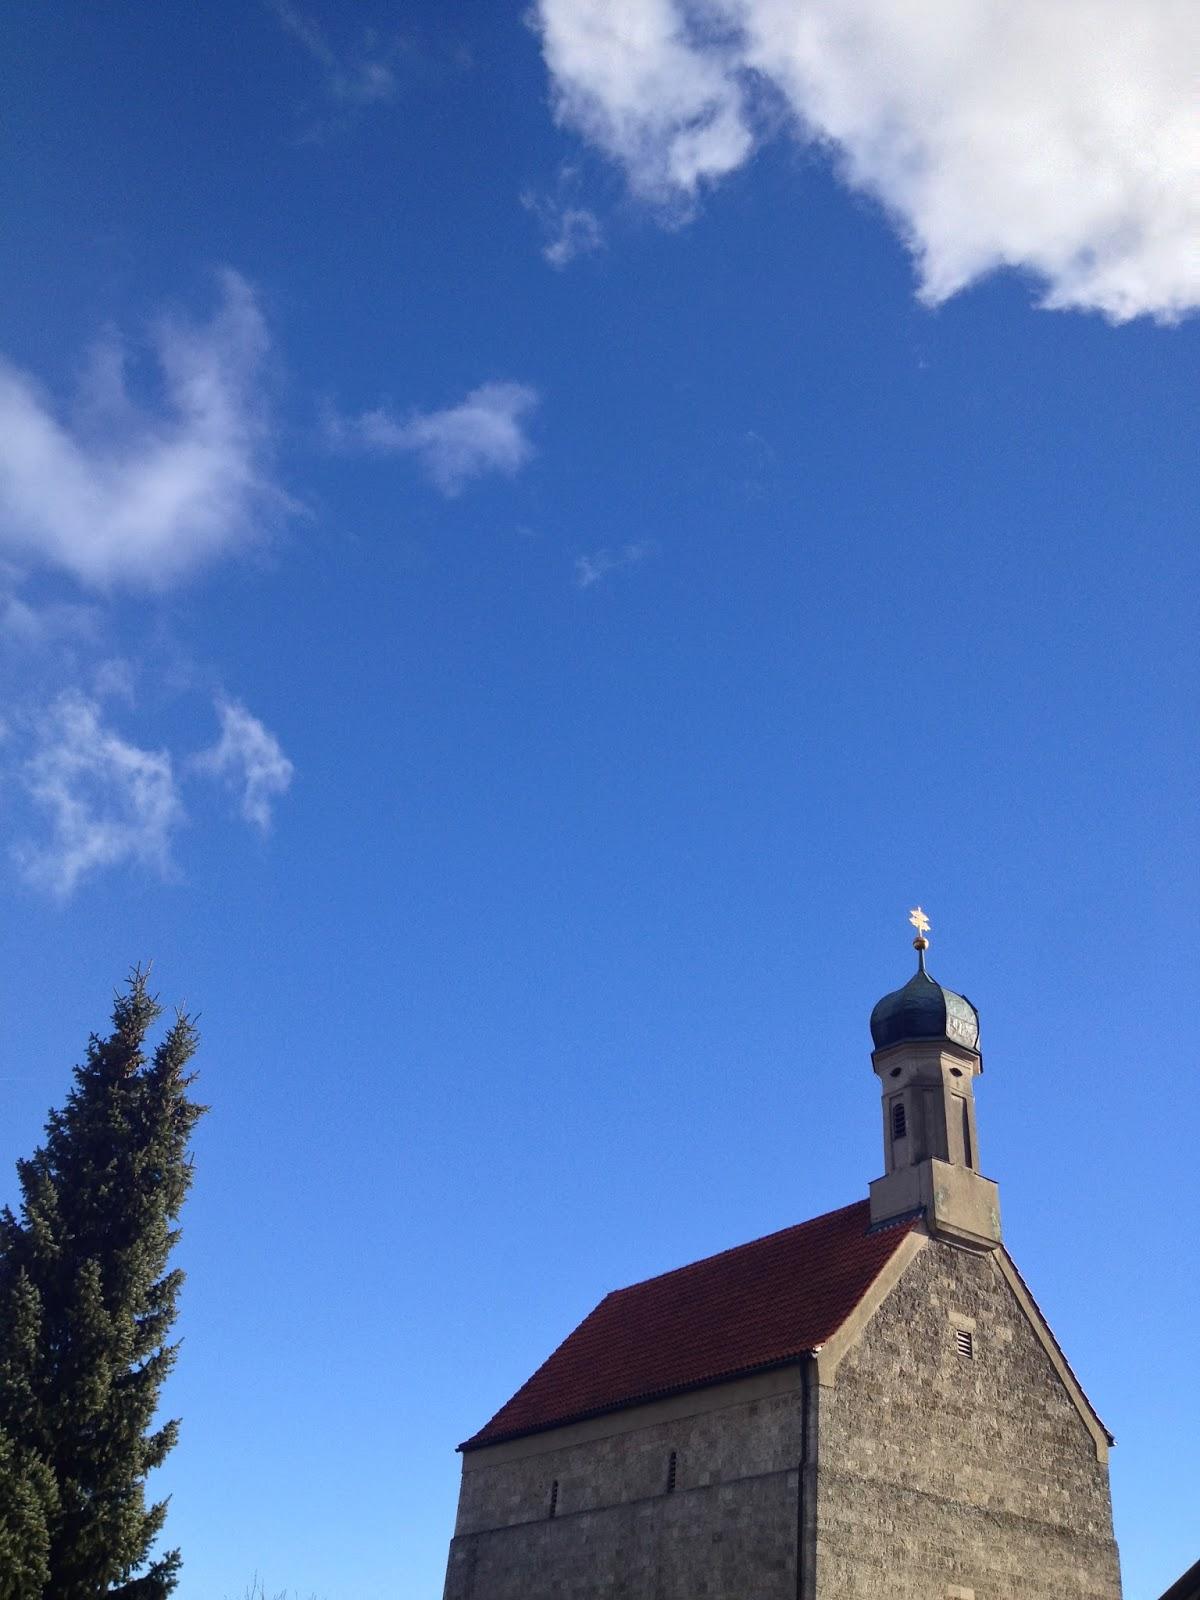 Kirche St. Jakob in Schondorf am Ammersee